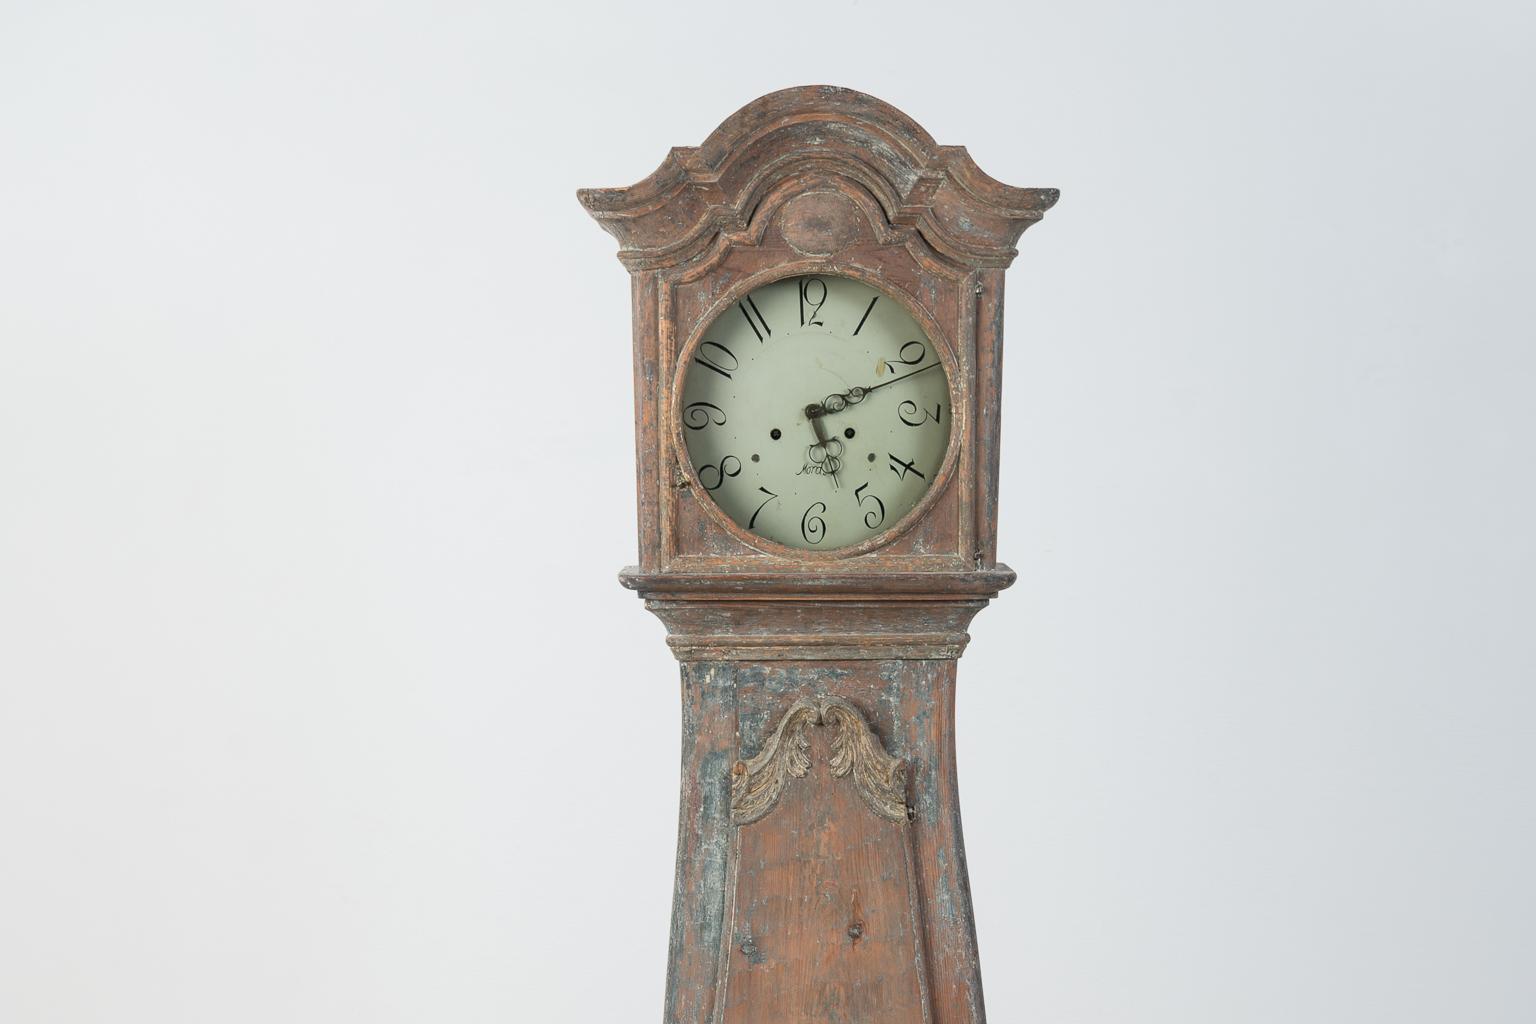 Early rococo clock